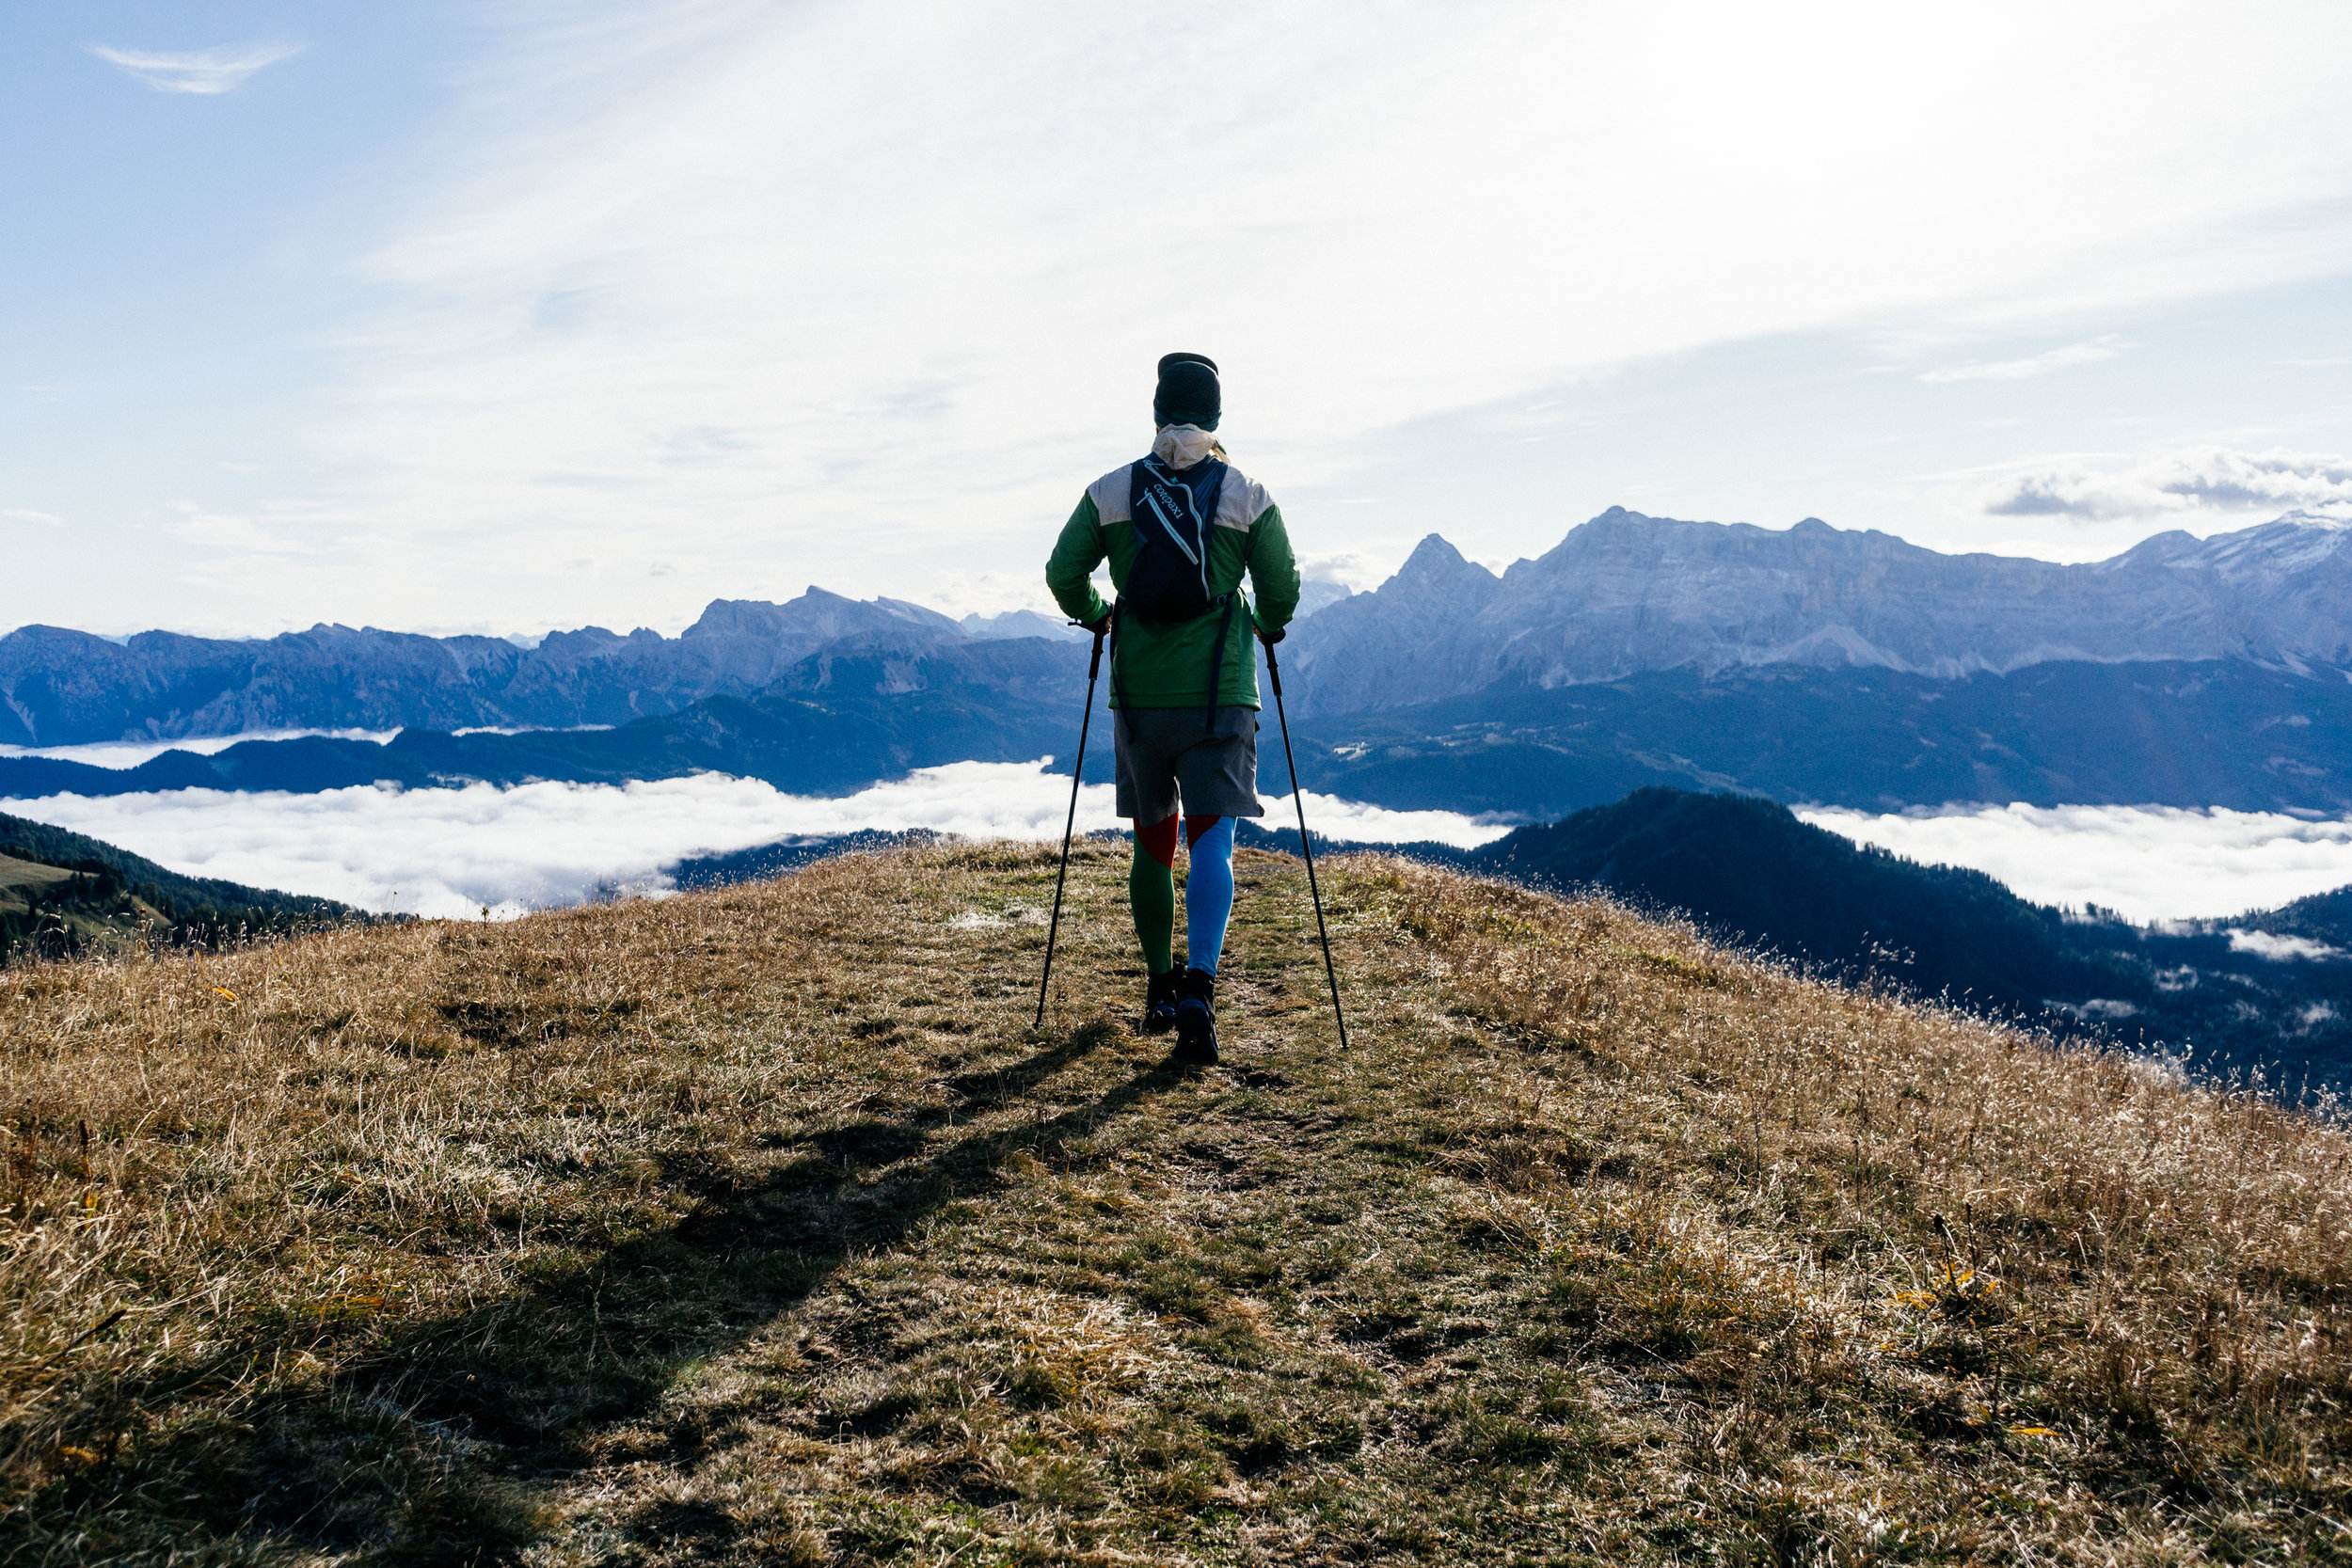 Dolomites-ChrisBrinleeJr-SEP17-113.jpg